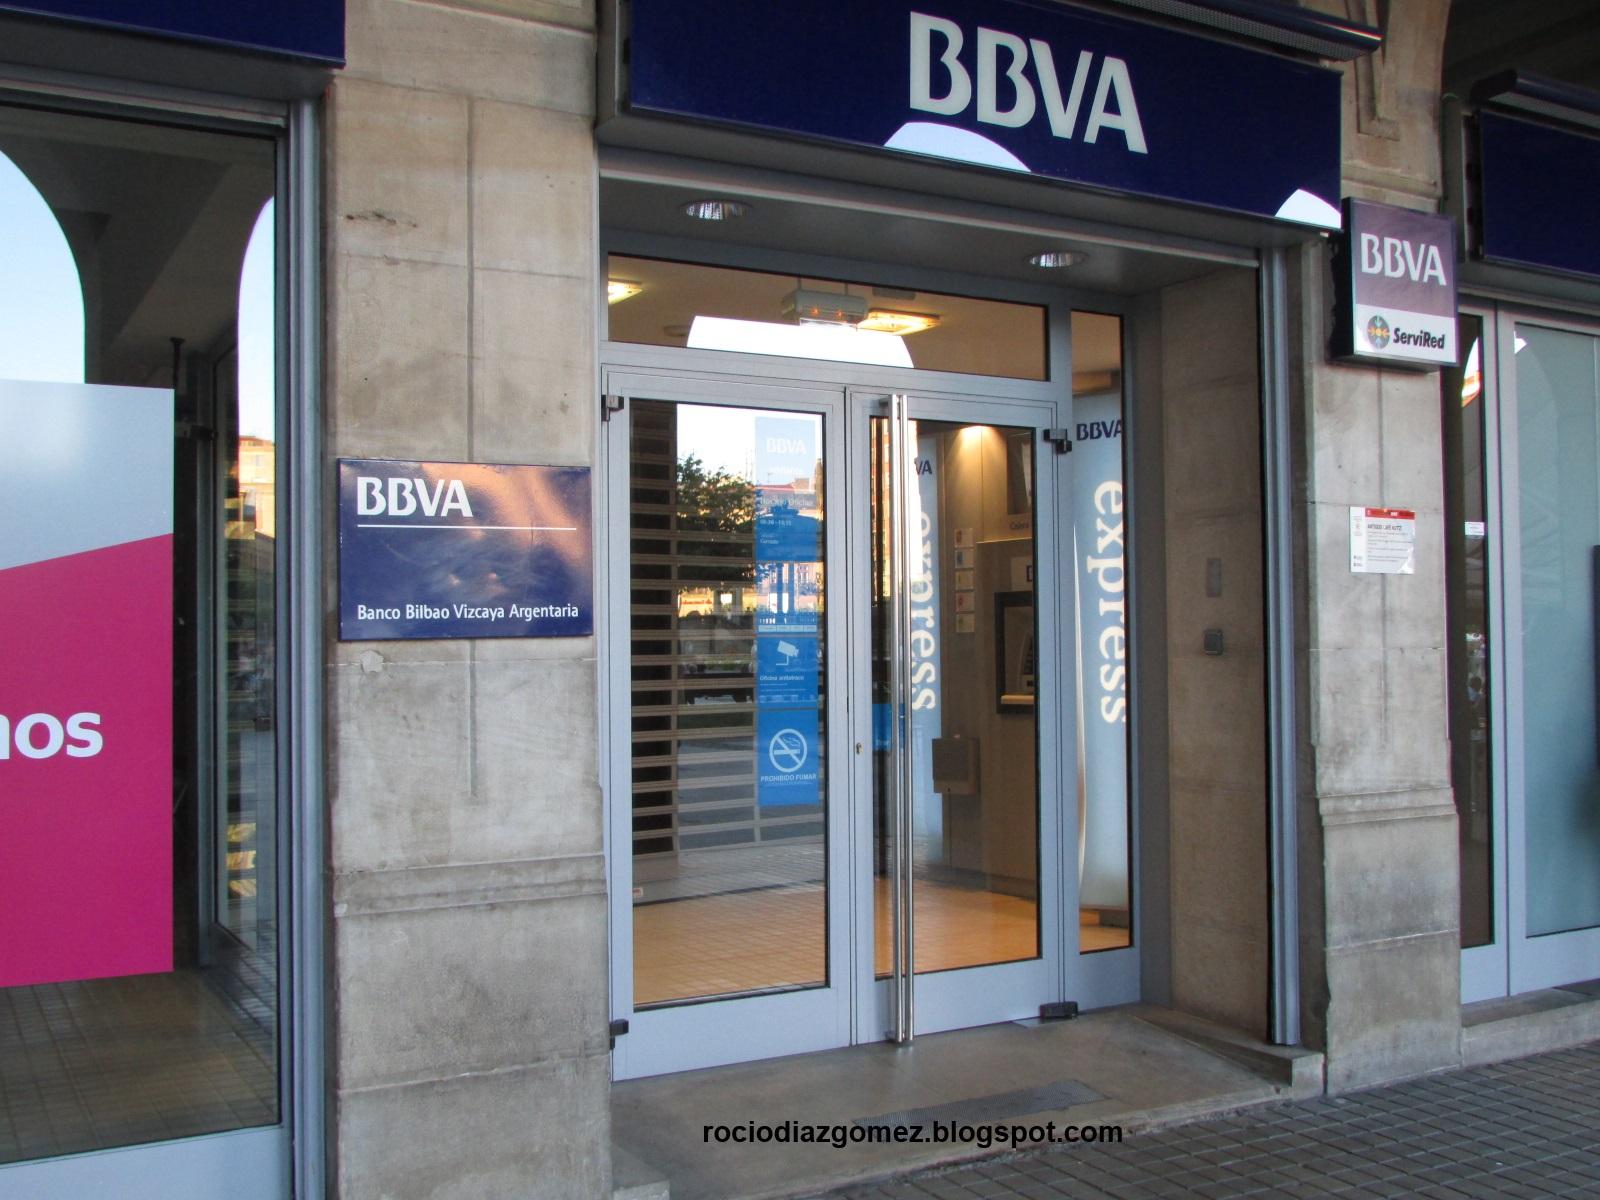 Roc o d az g mez hemingway una ruta literaria por pamplona for Oficinas banco bilbao